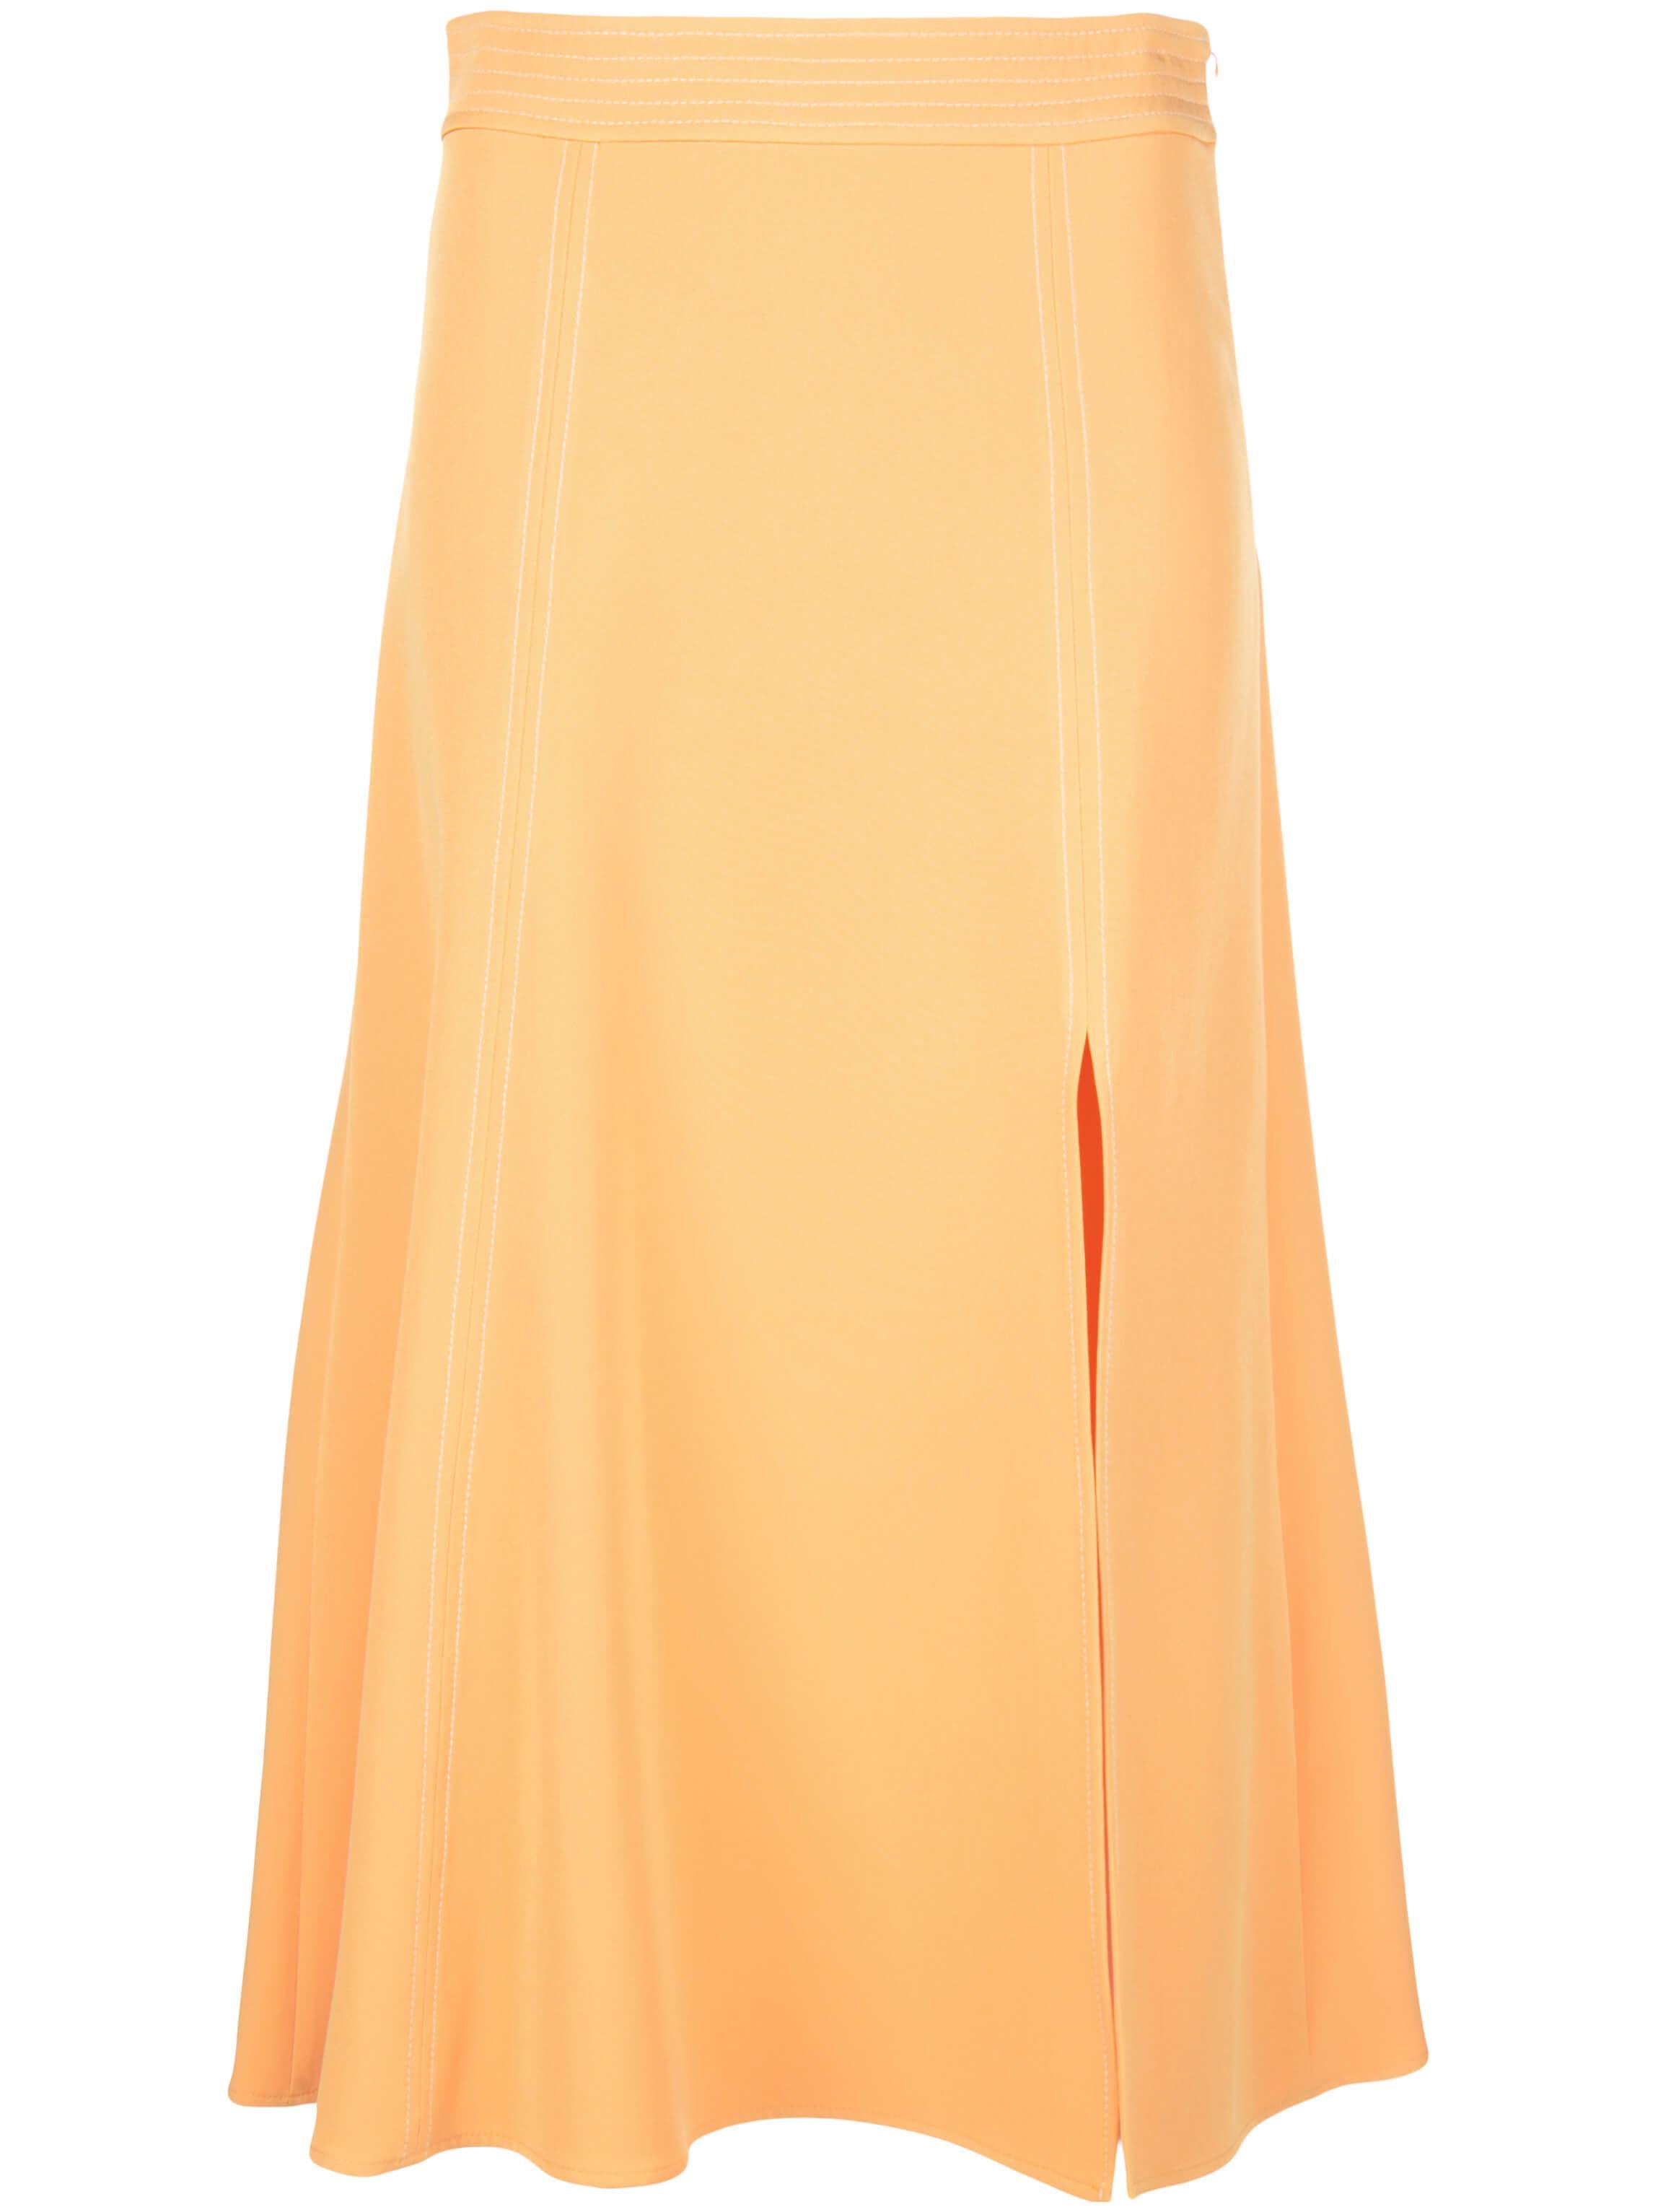 Jada Solid Cady Skirt With Slit Item # SG2972